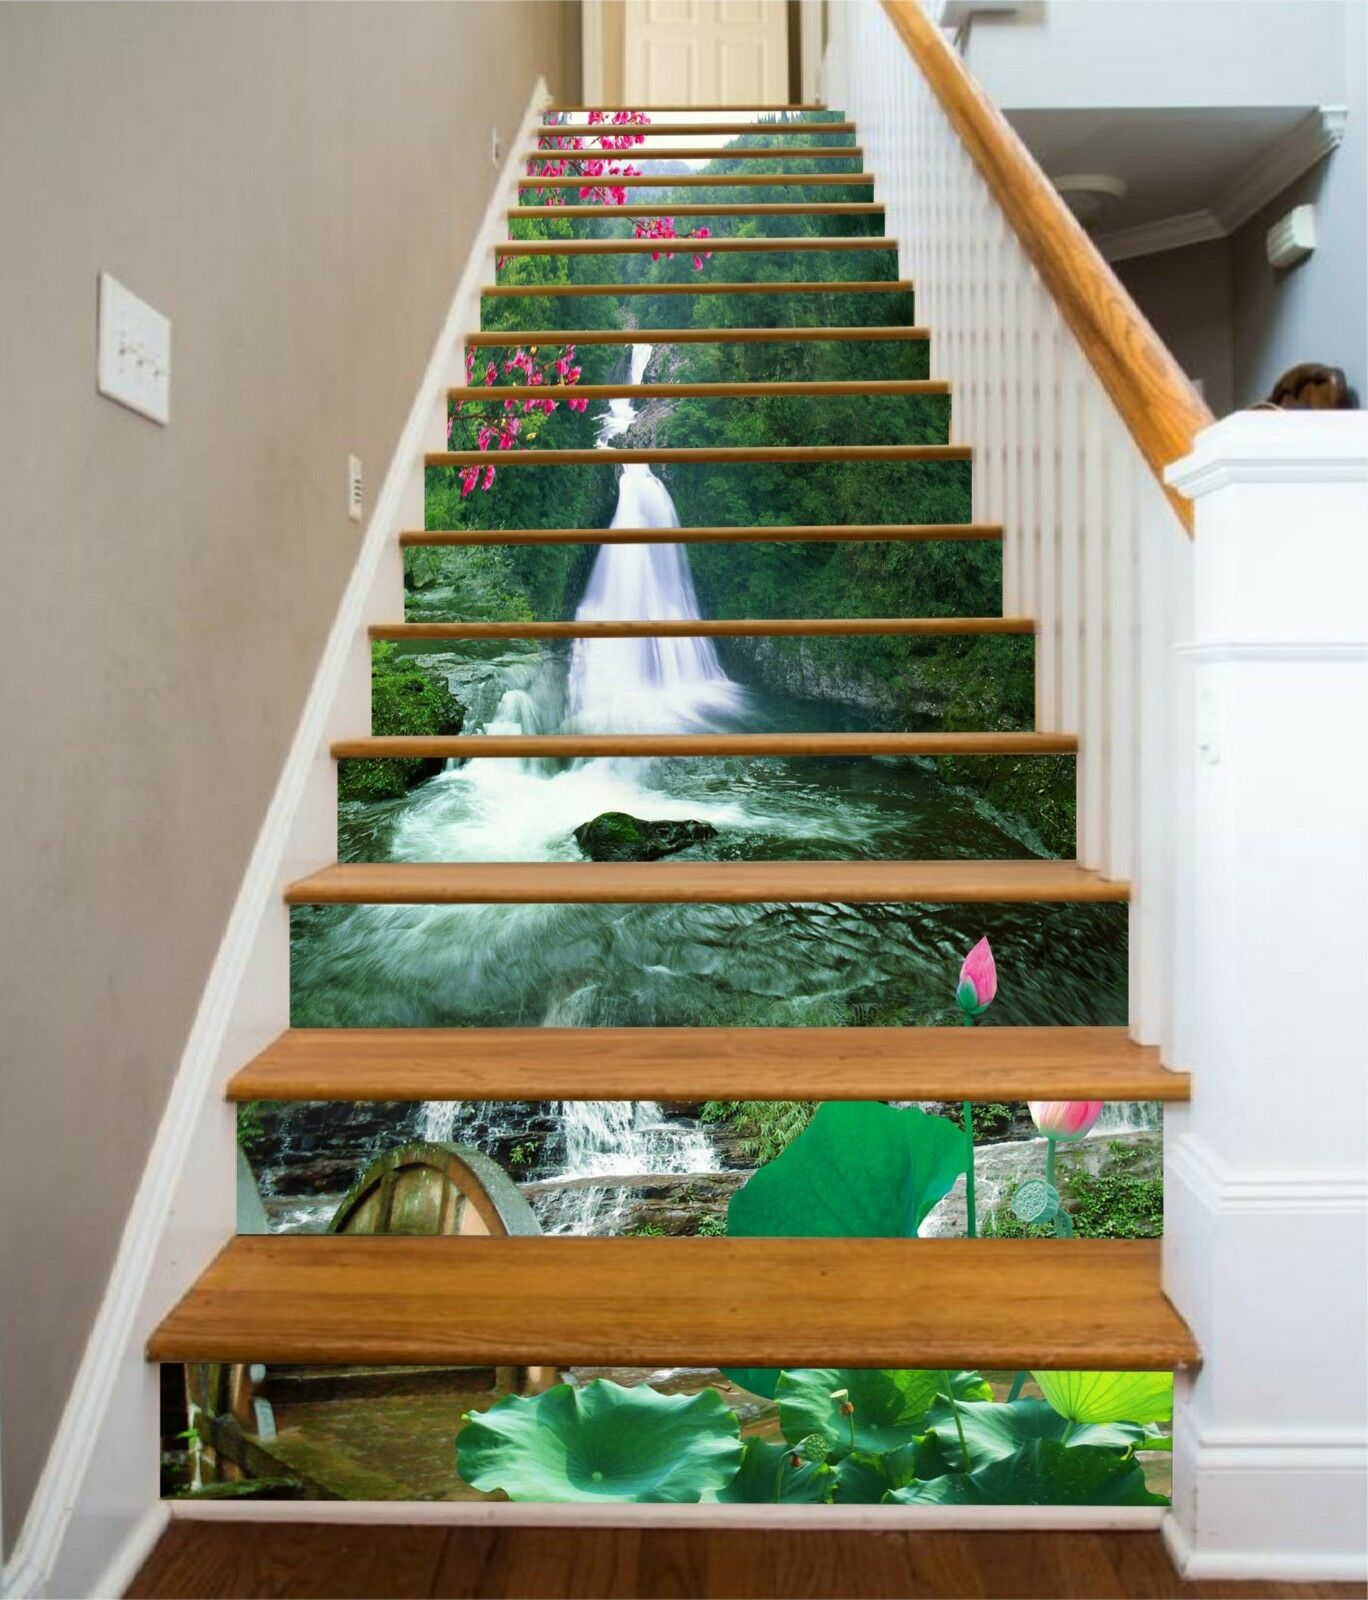 3D Mountains Lotus Stair Risers Decoration Photo Mural Vinyl Decal WandPapier UK